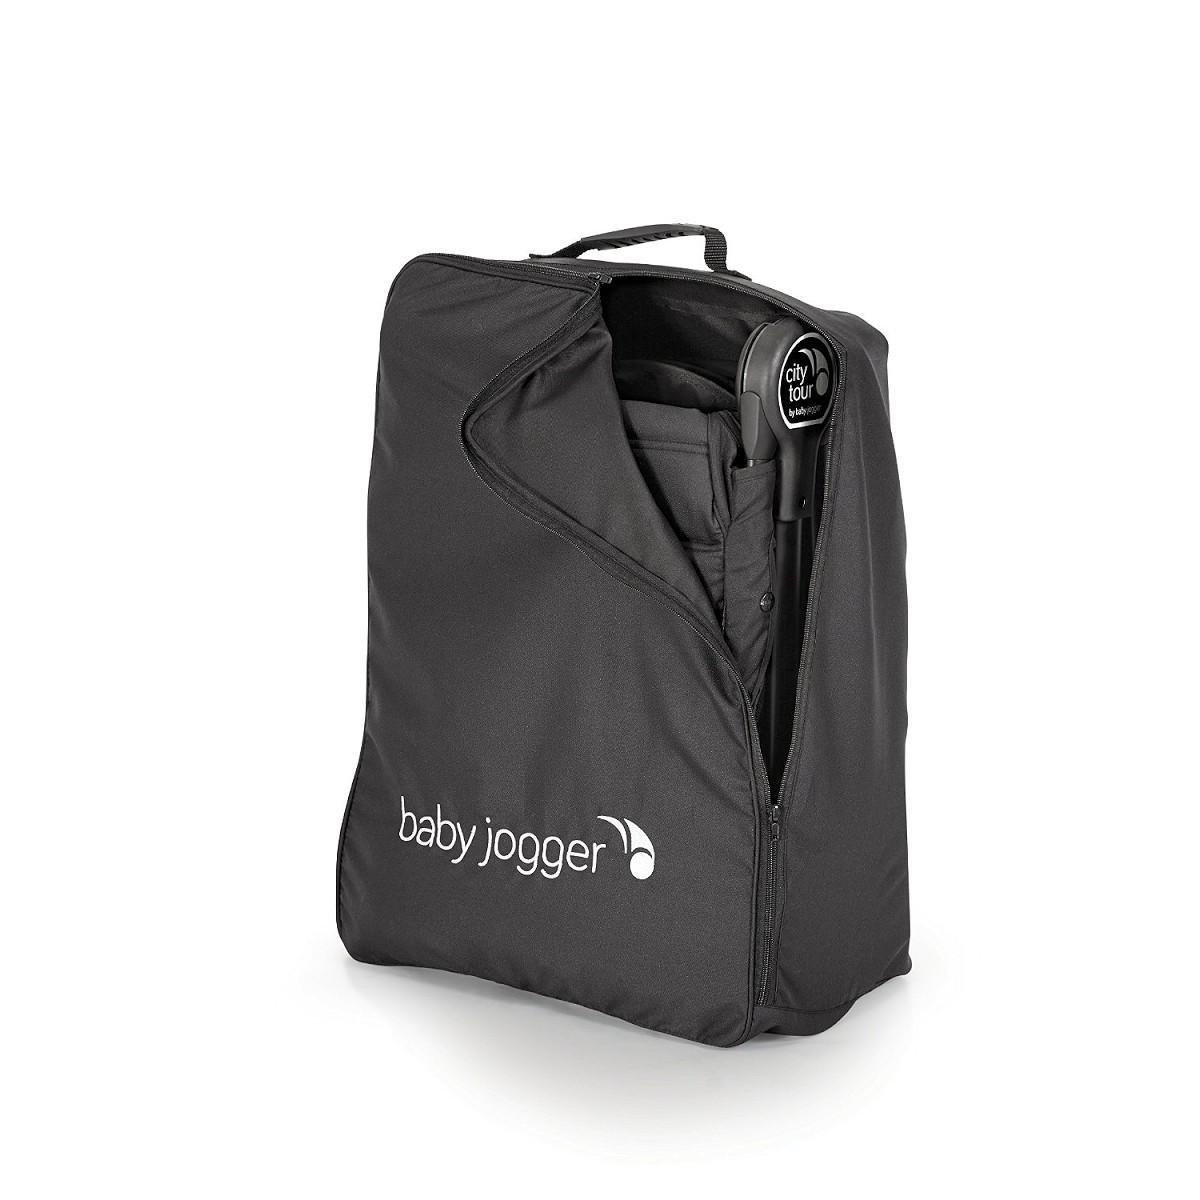 baby-jogger-city-tour-compact-stroller-7-.jpg